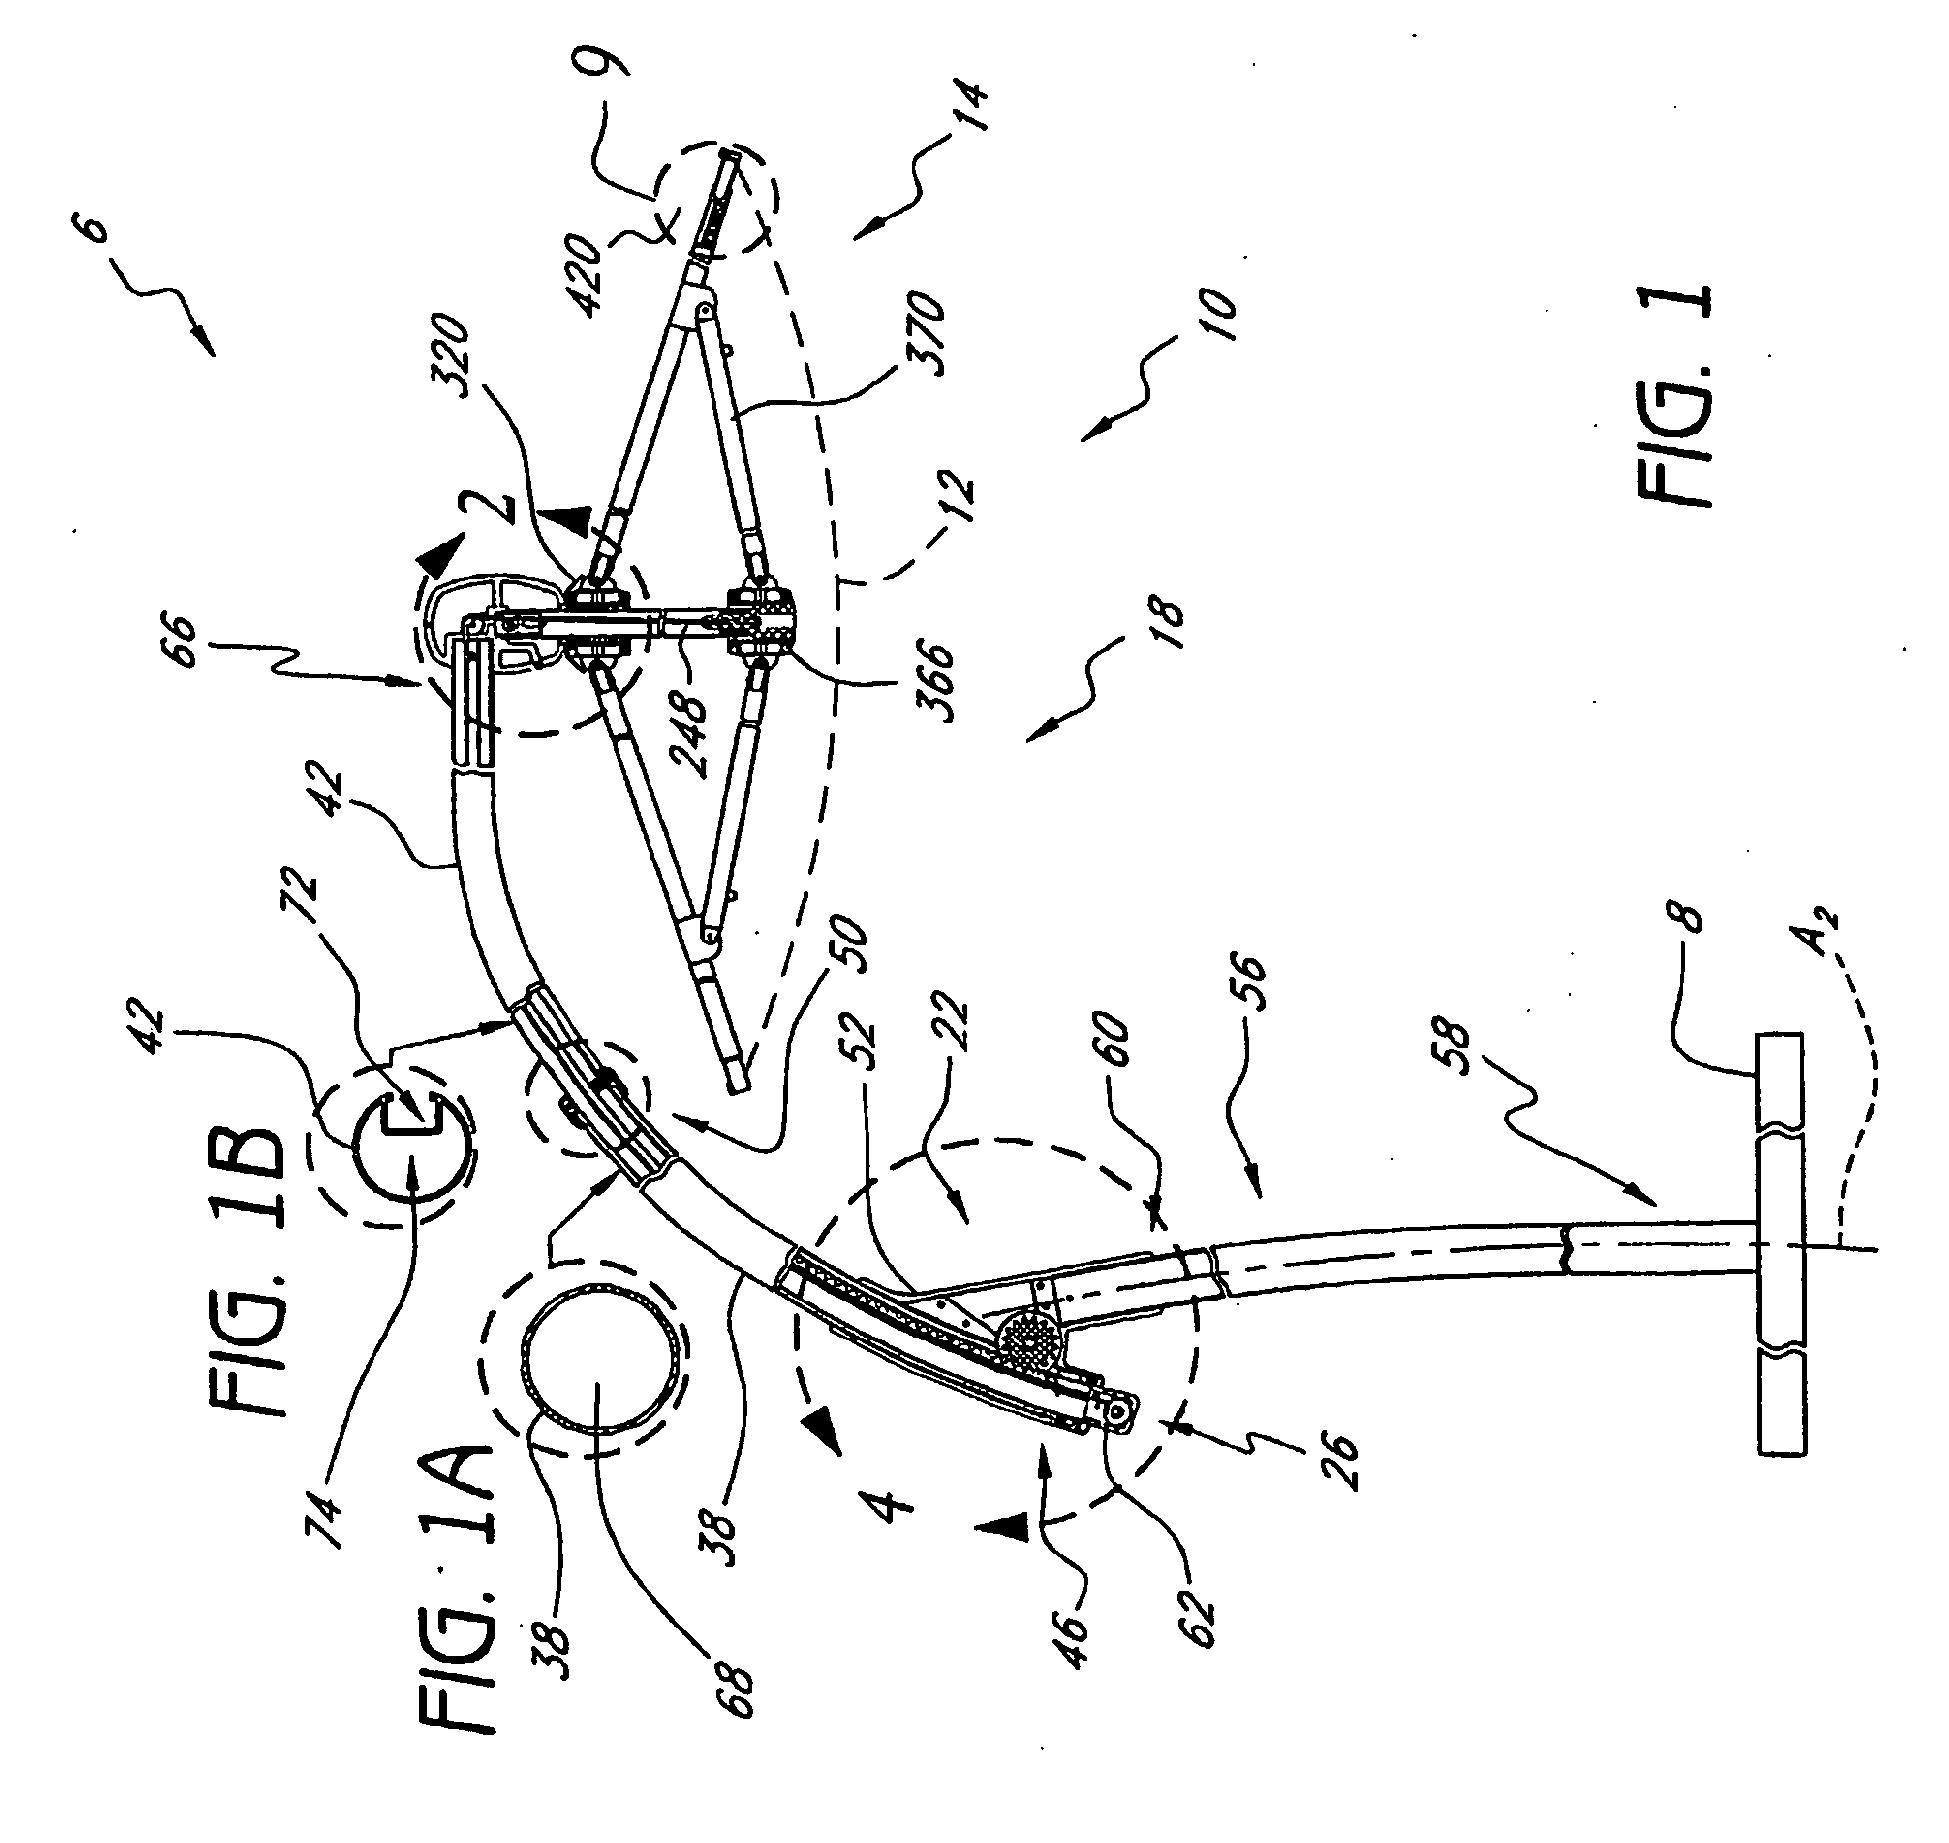 patent ep1637052b1 umbrella google patents. Black Bedroom Furniture Sets. Home Design Ideas